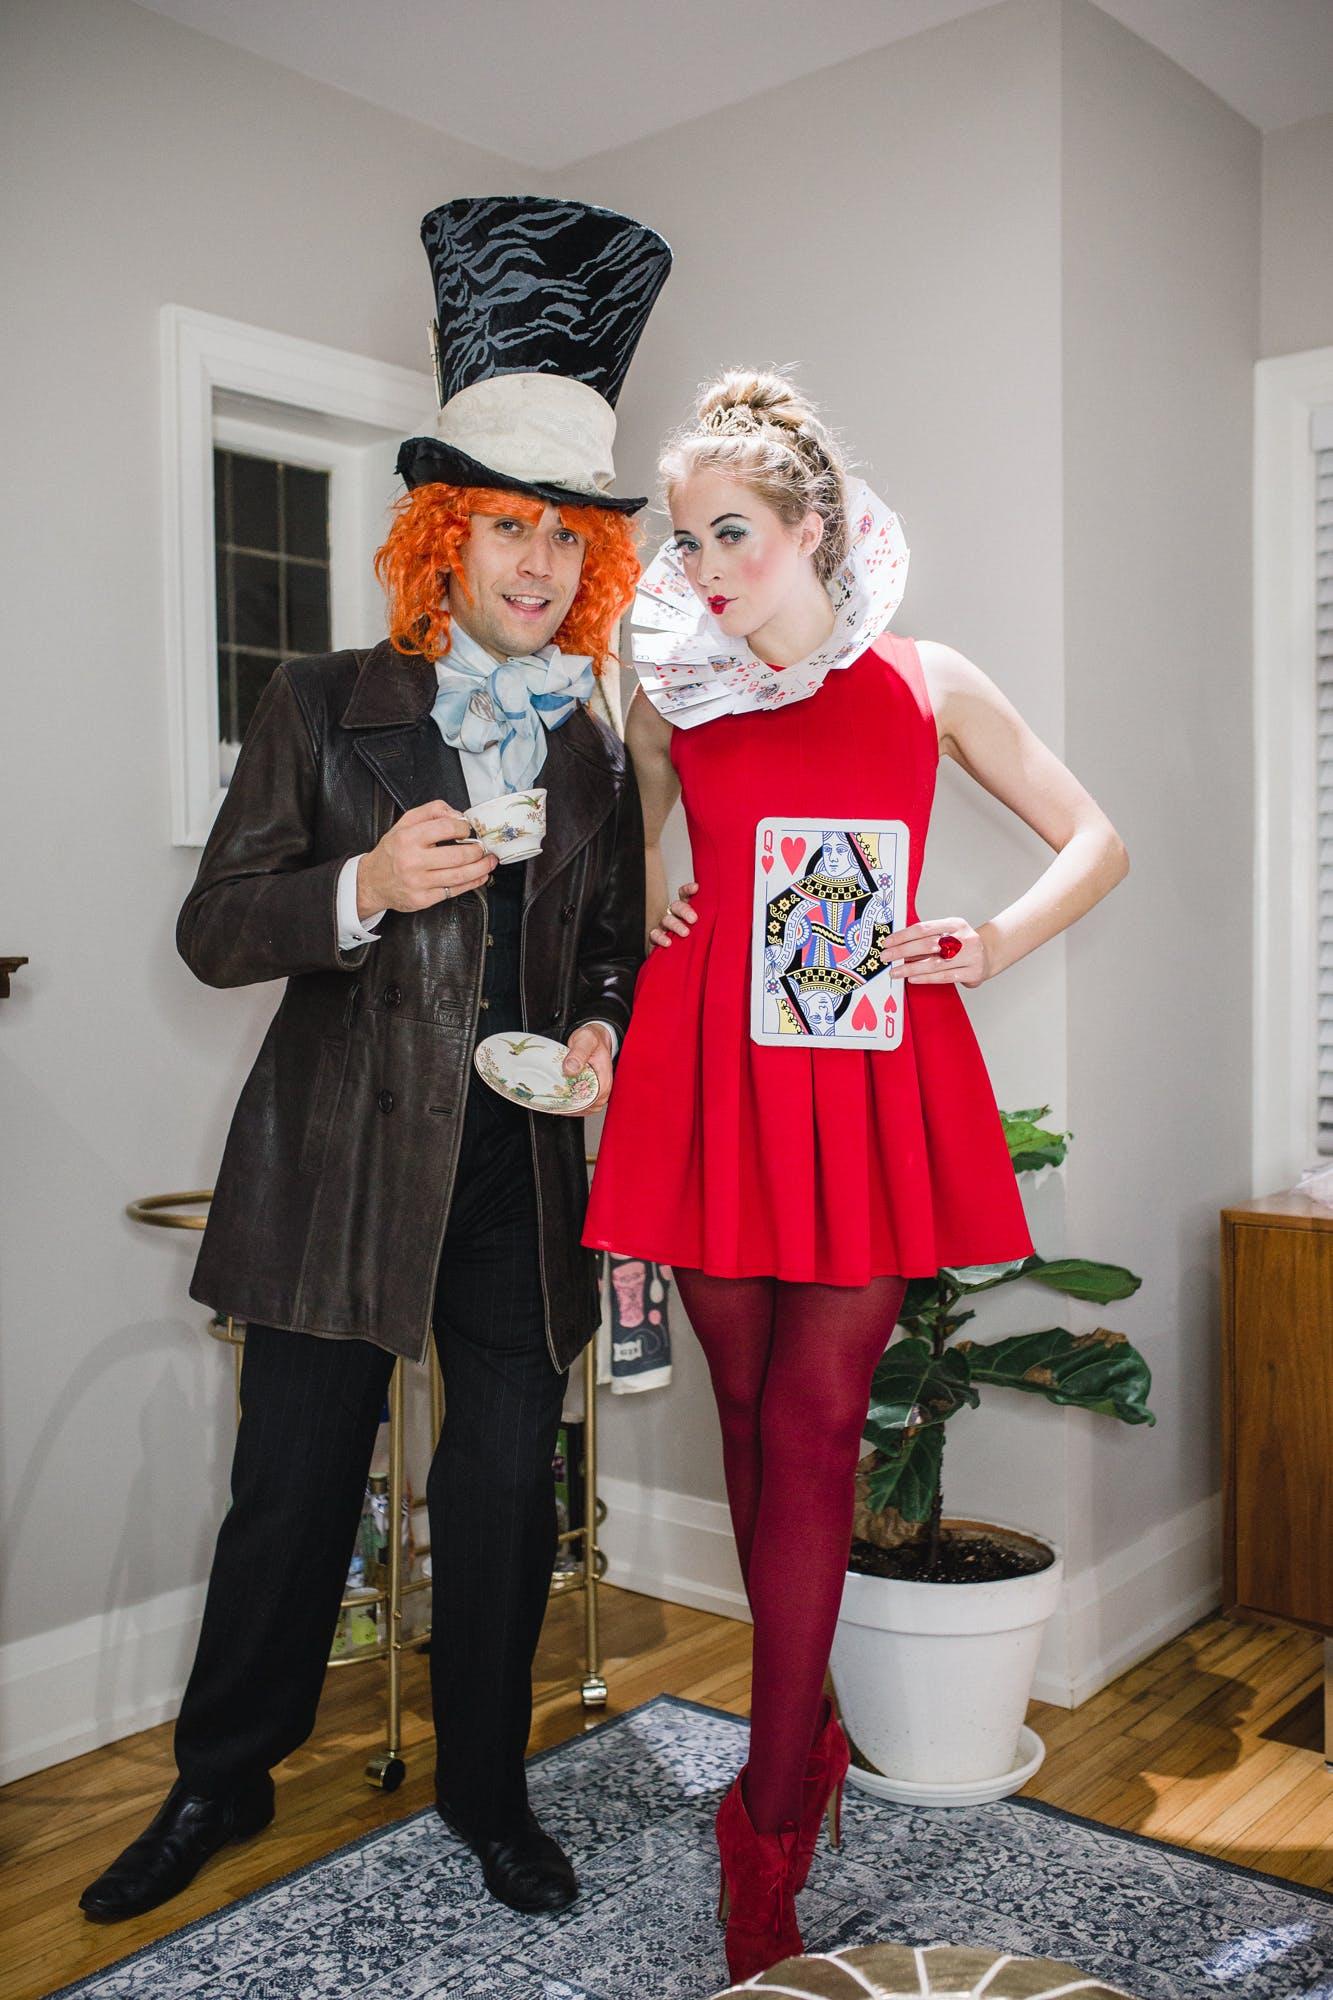 Alice in Wonderland couples halloween costume - DIY Mad Hatter and Queen of Hearts costume idea